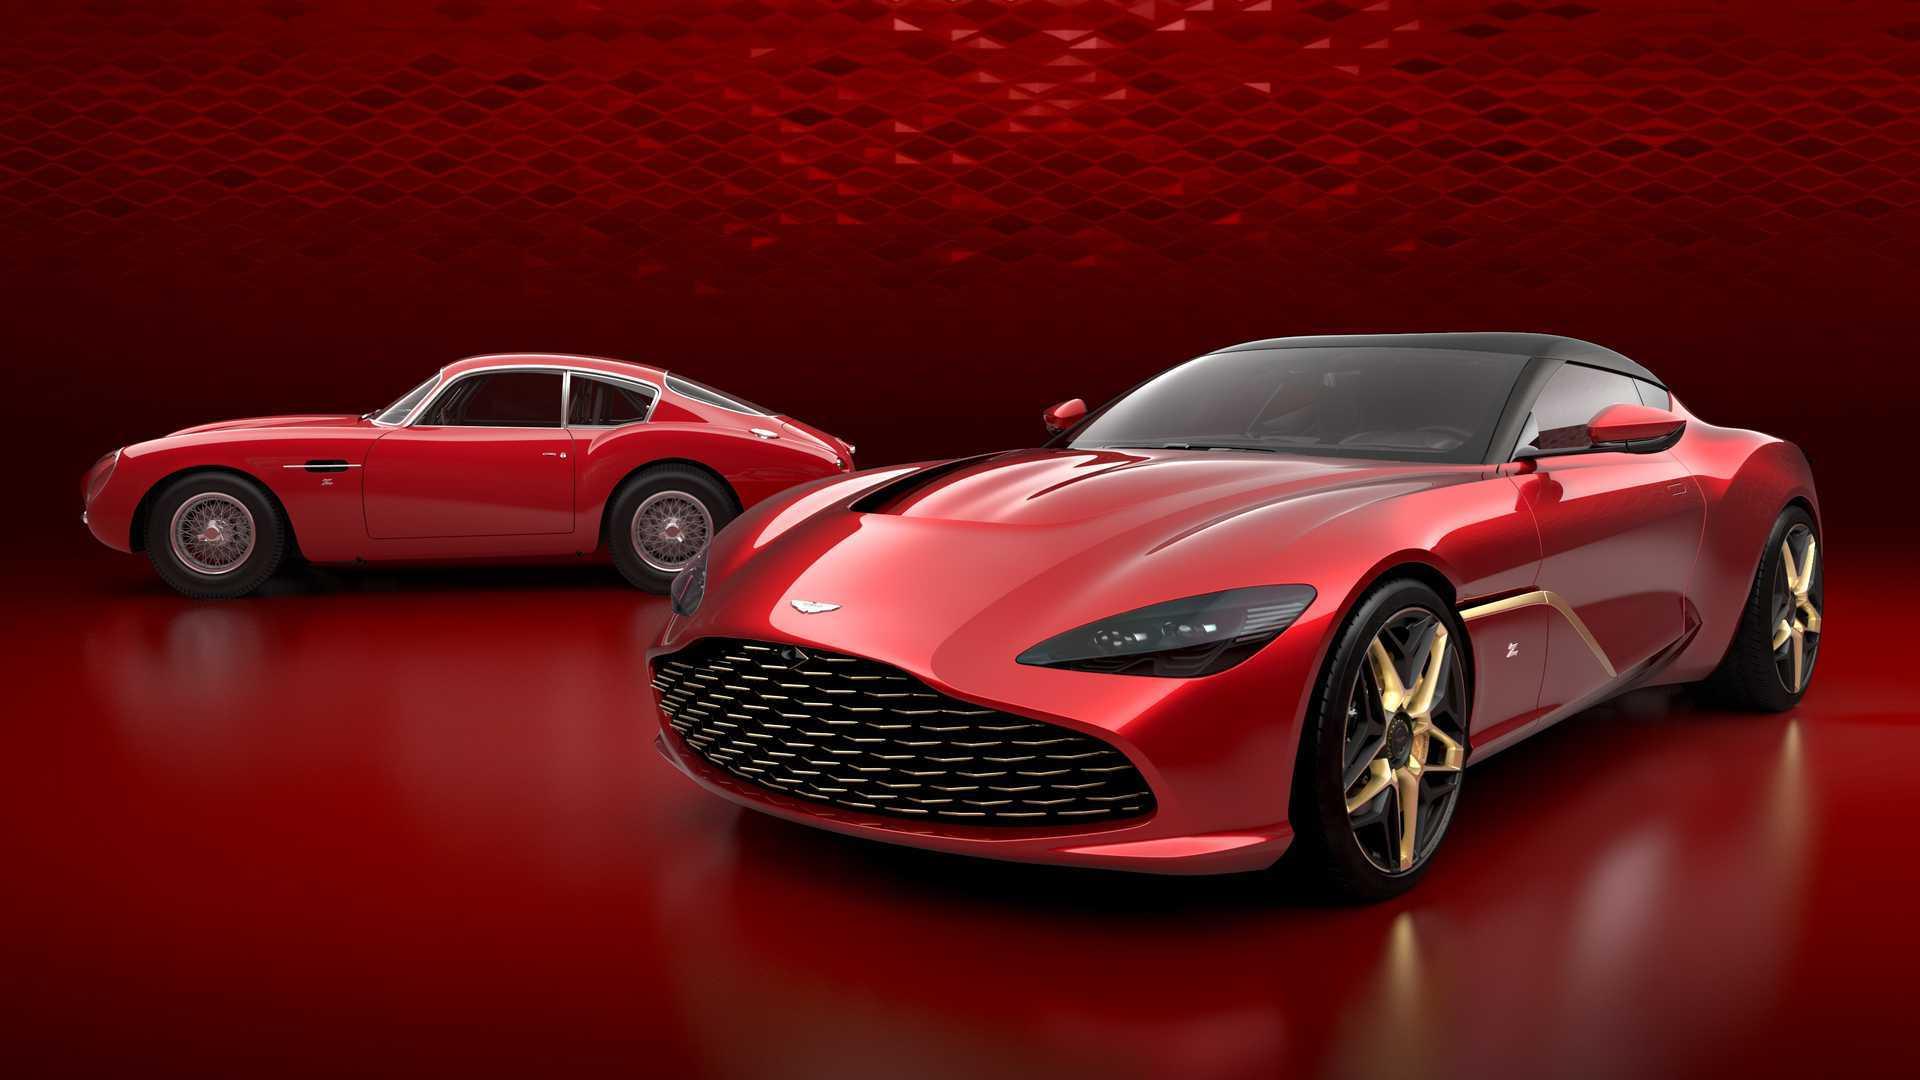 Aston Martin Dbs Gt Zagato Shows Off Its Stunning Final Form